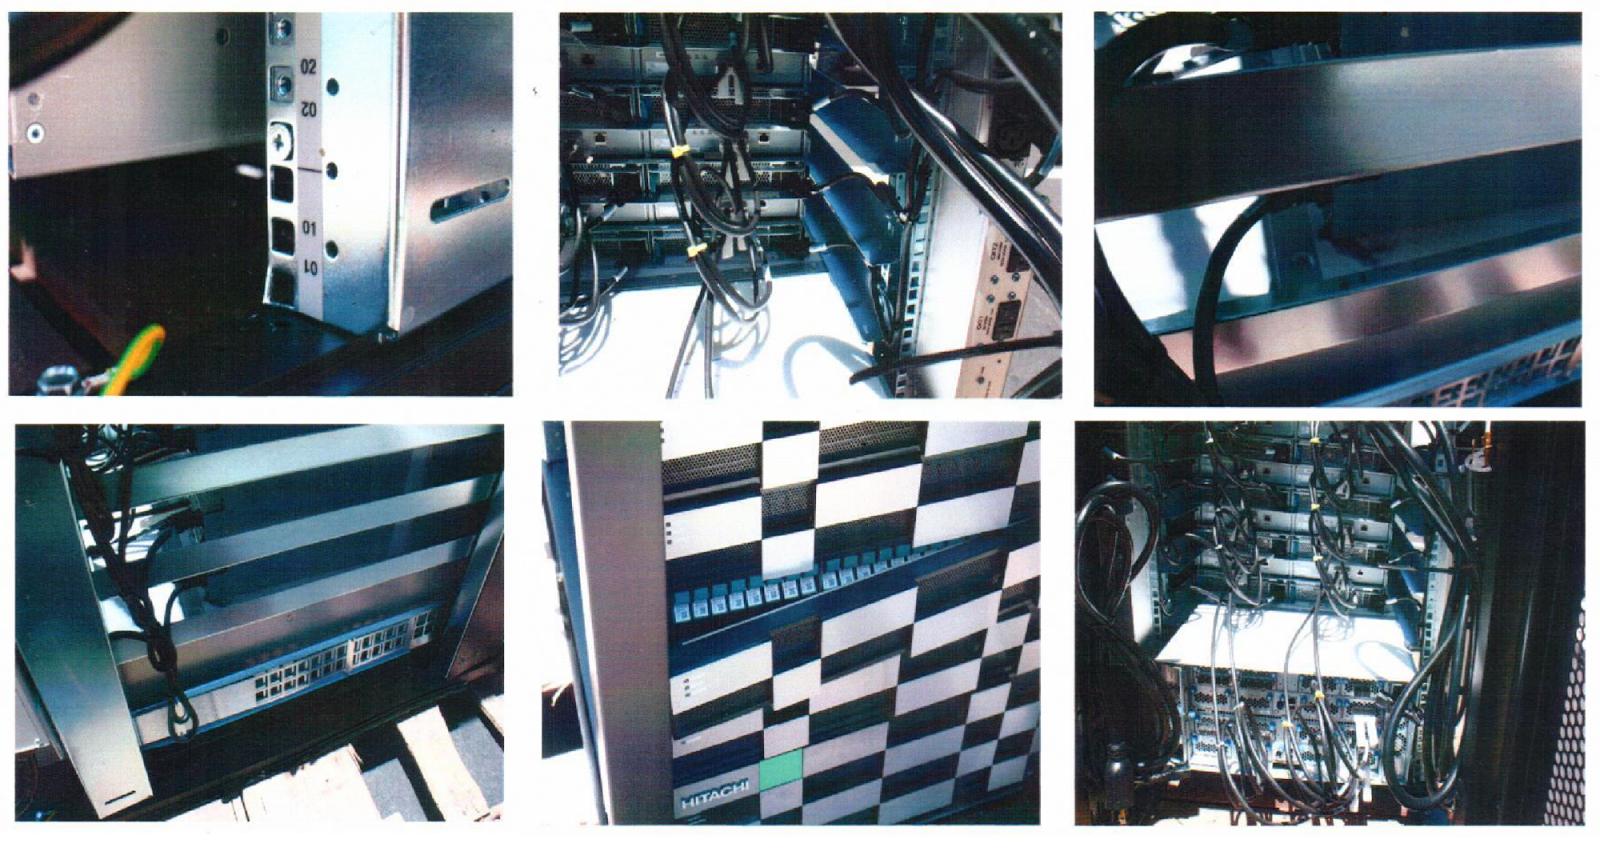 irGRiD: HDS VSP Hitachi Virtual Storage Platform G1000 - NEW